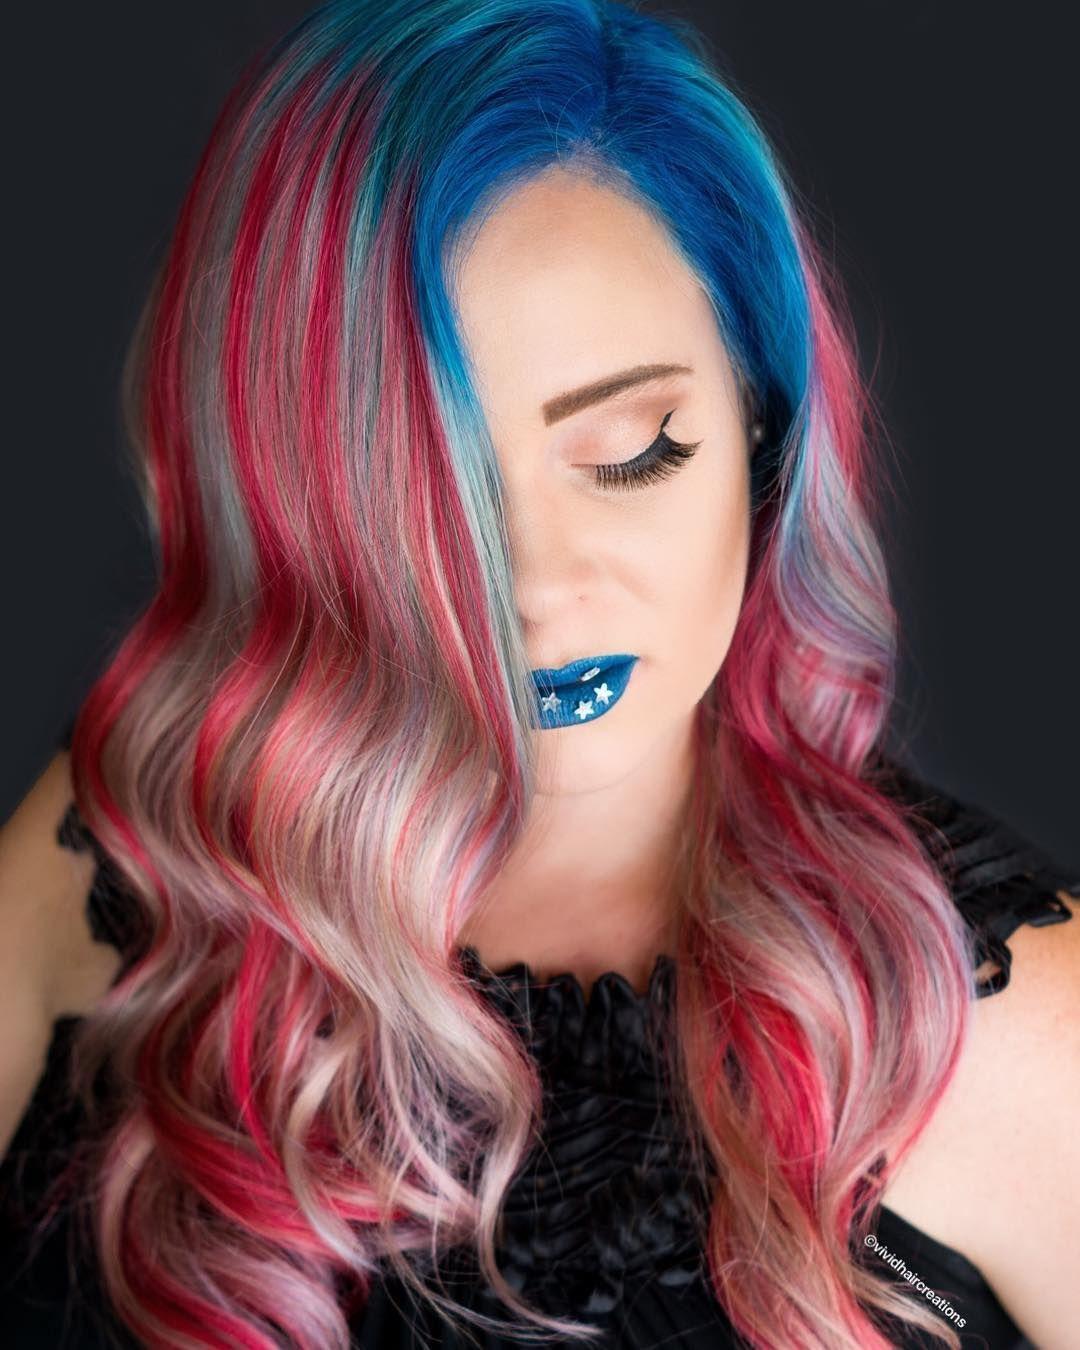 Vividhaircreations Pravanavivids Vivid Hair Color Hair Inspiration Long Hair Styles